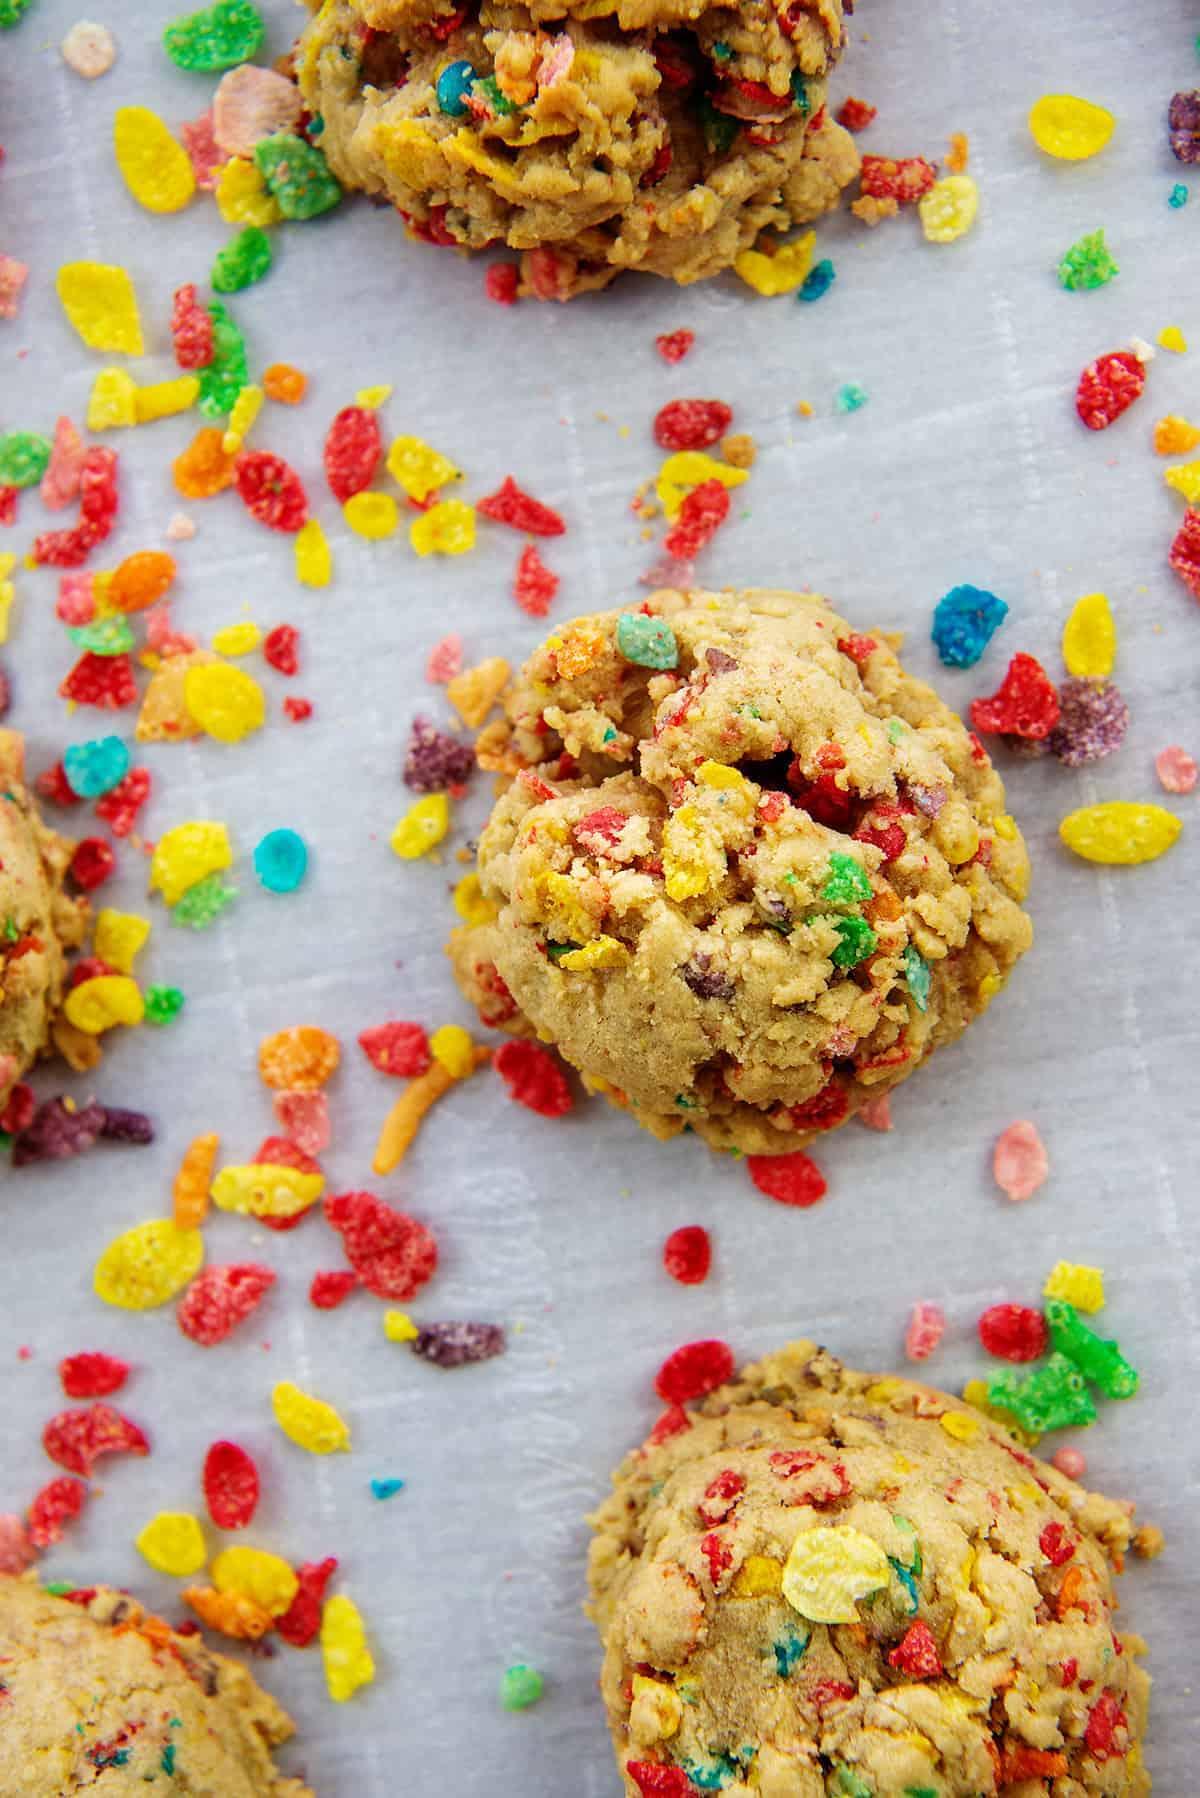 Fruity pebbles cookies on baking sheet.